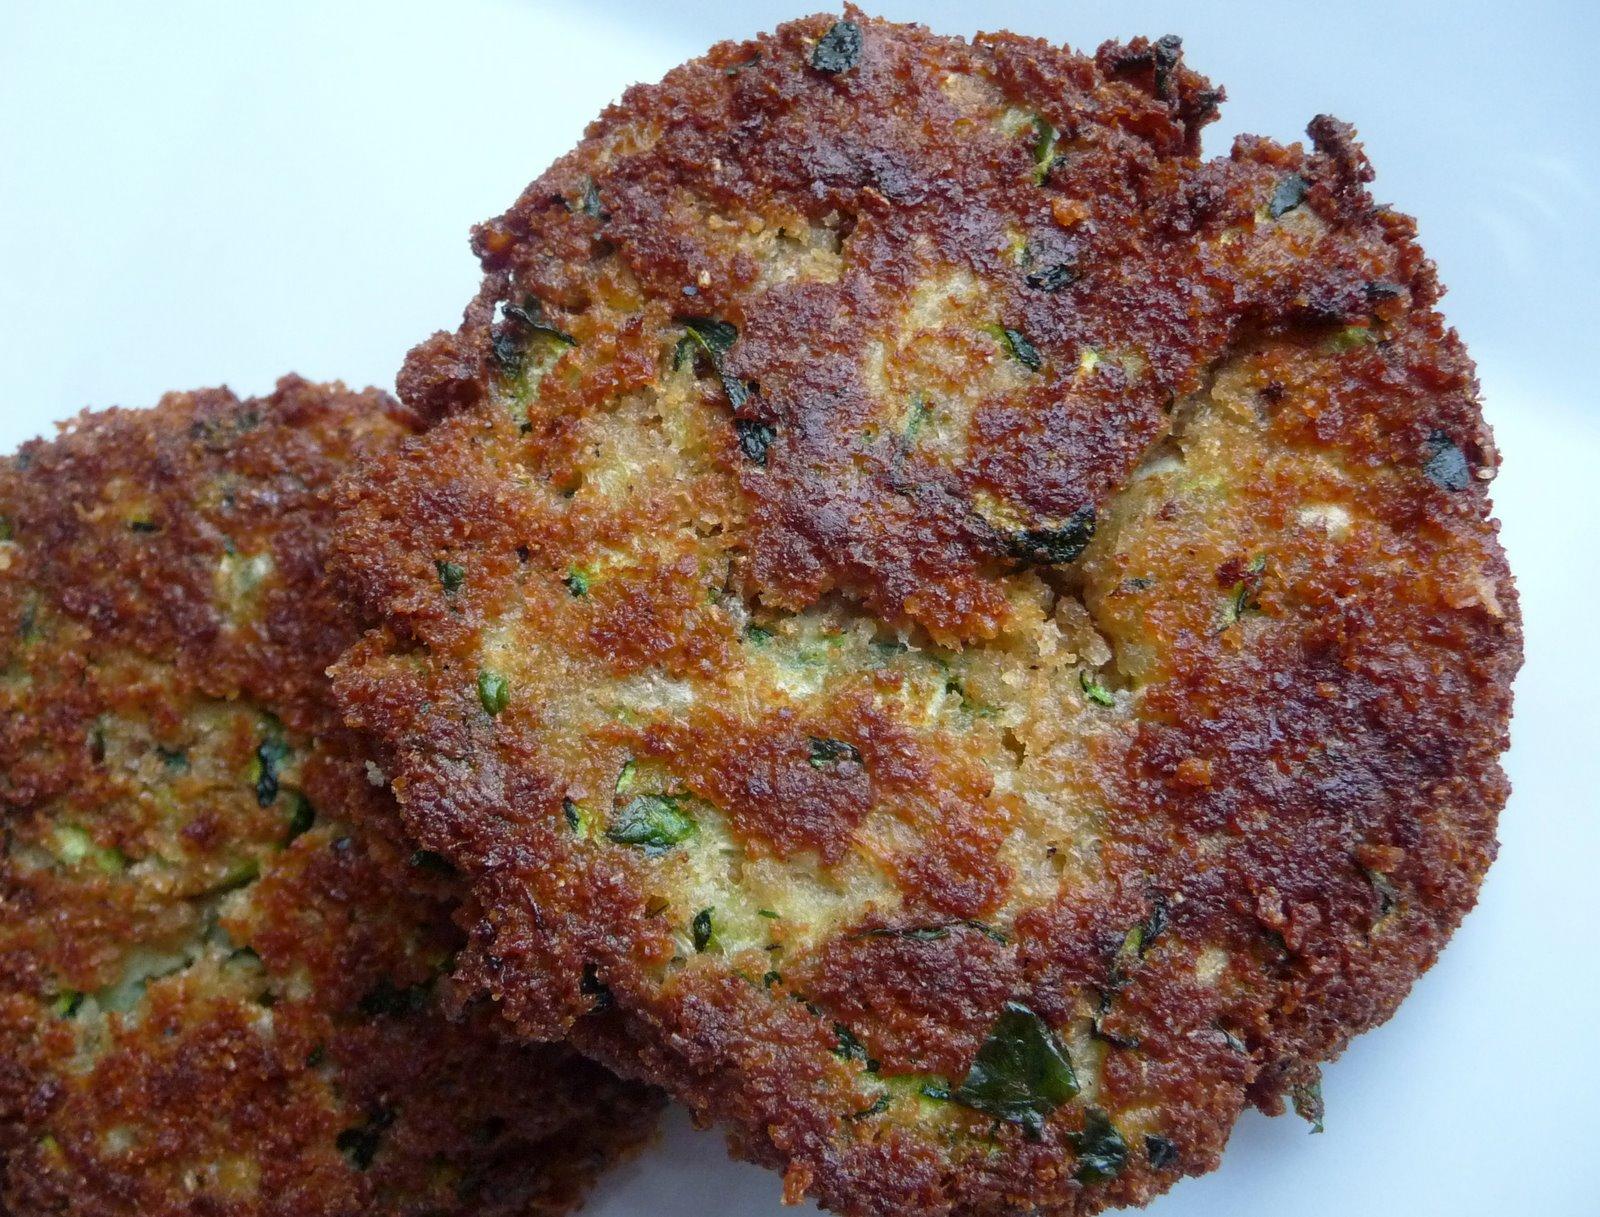 Christine's Cuisine: Zucchini Ricotta Fritters